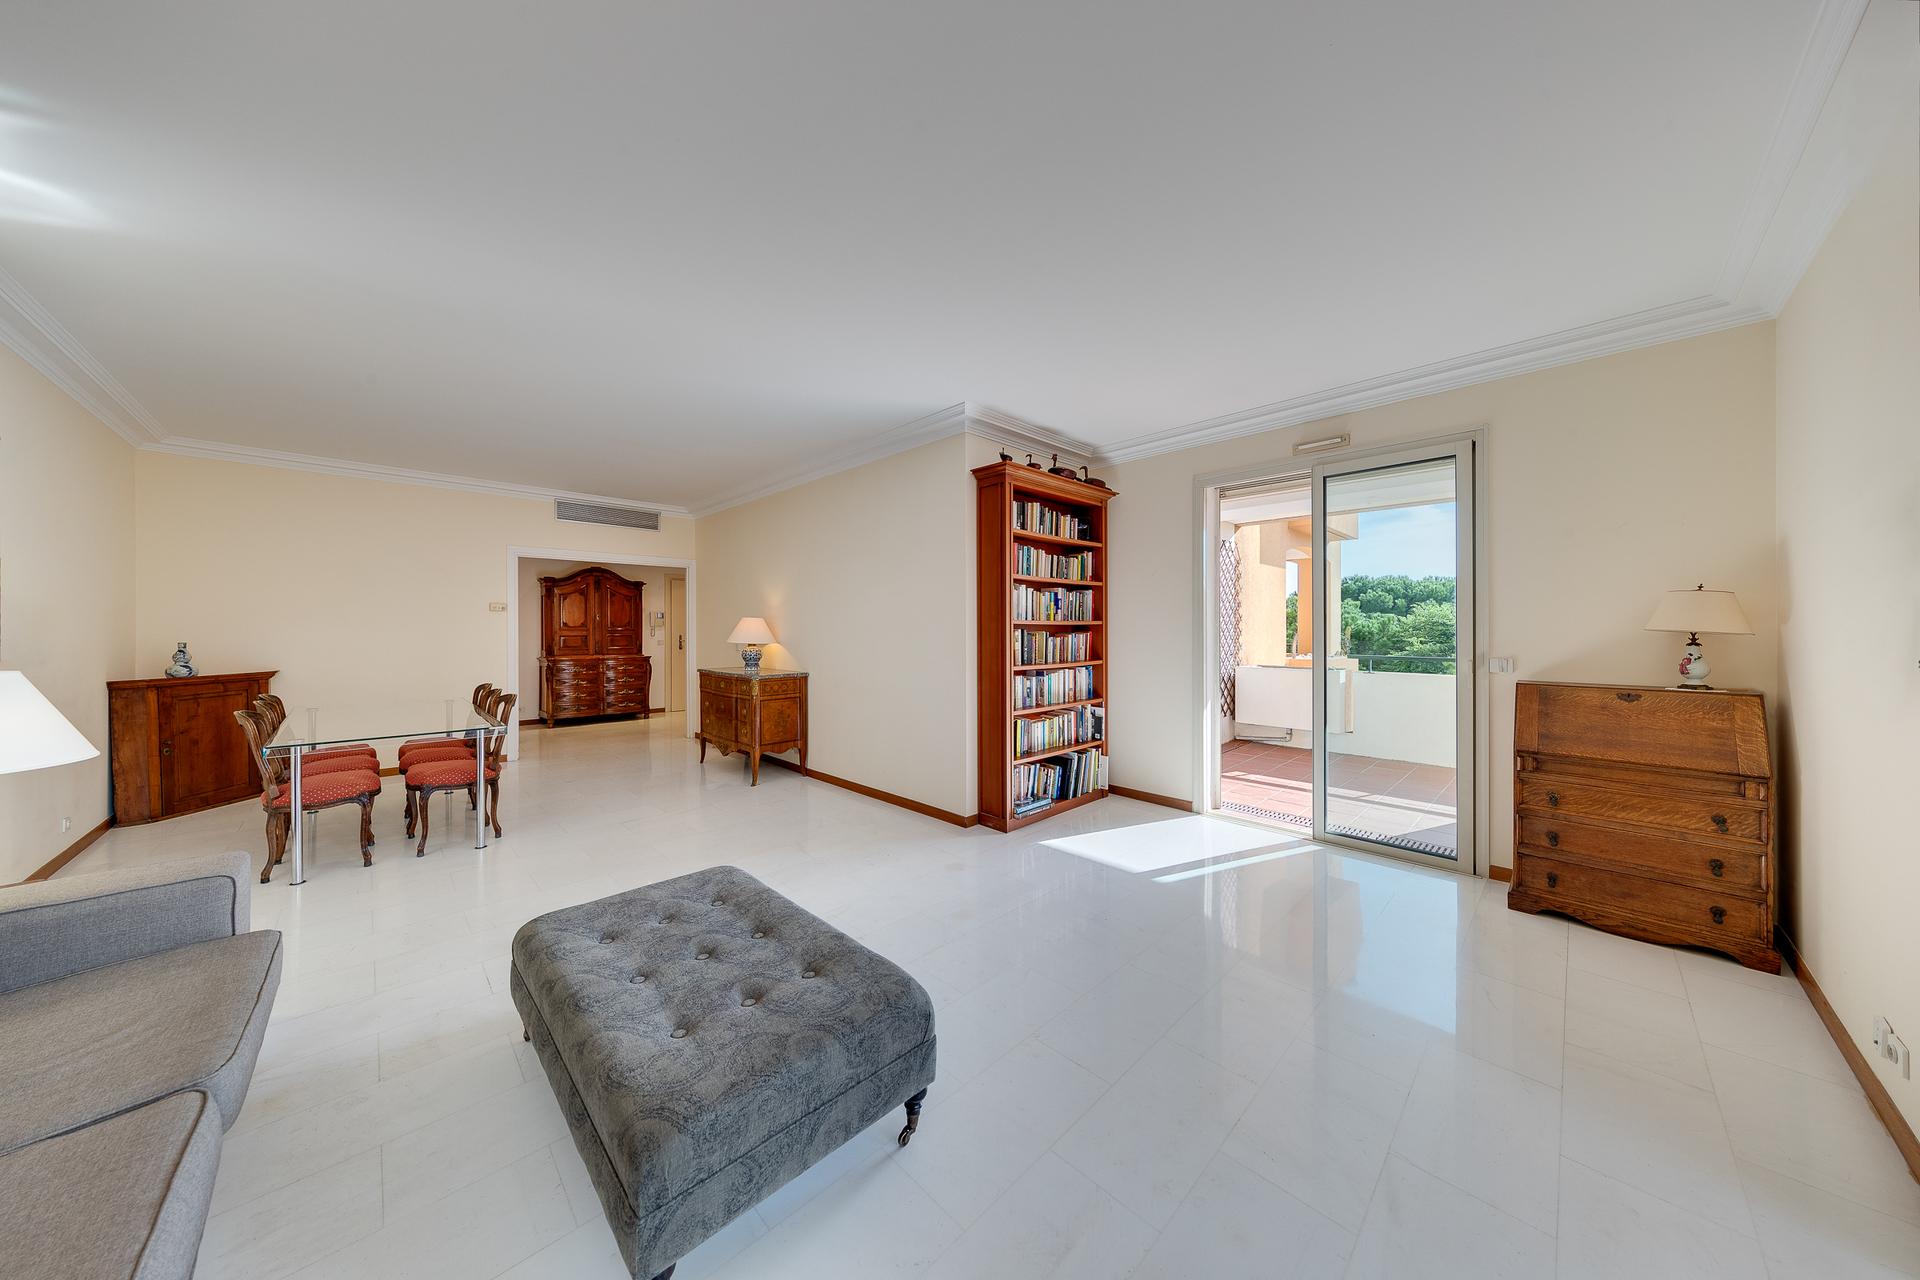 Monte Marina spacious 2 bedroom apartment for sale, possibility to add a 3rd bedroom - Vendita di uffici